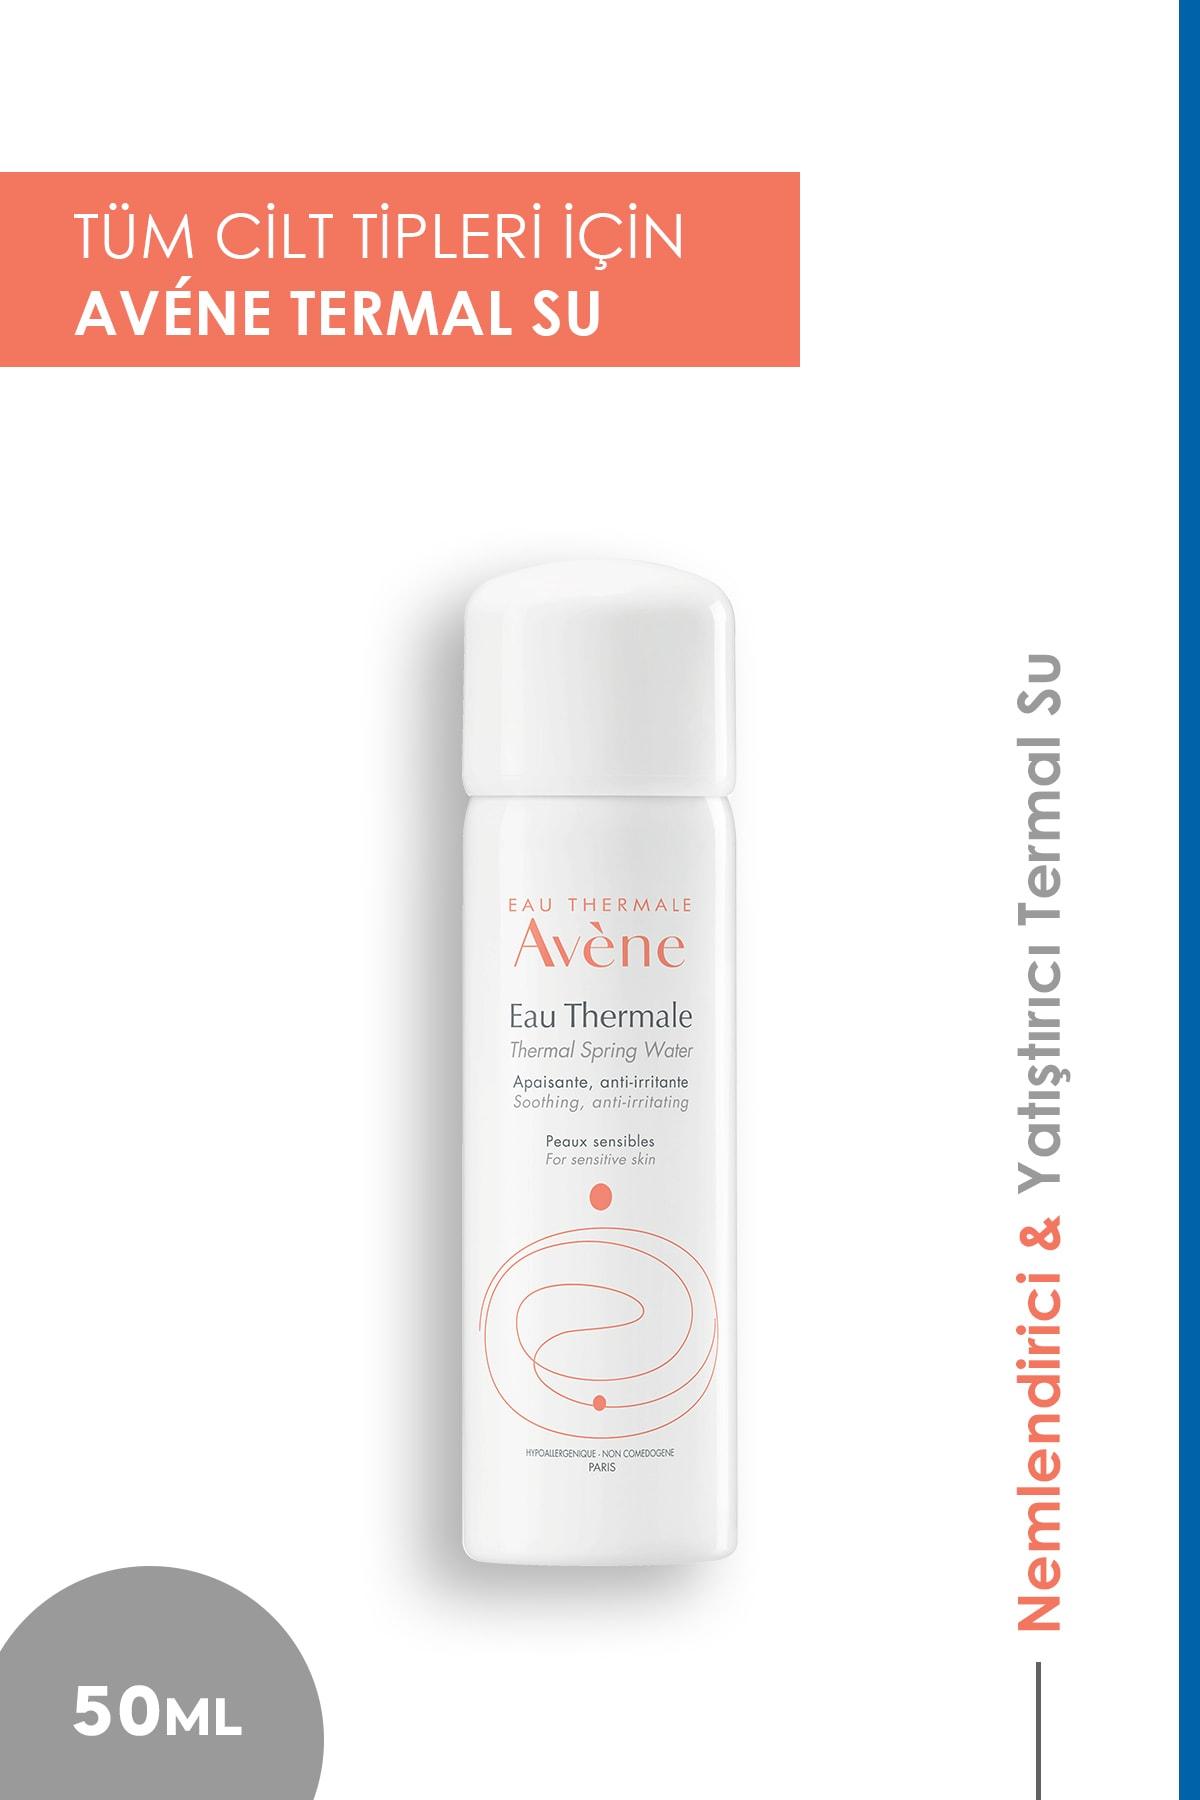 Avene Eau Thermale Spray 50 Ml (termal Su Spreyi) 1